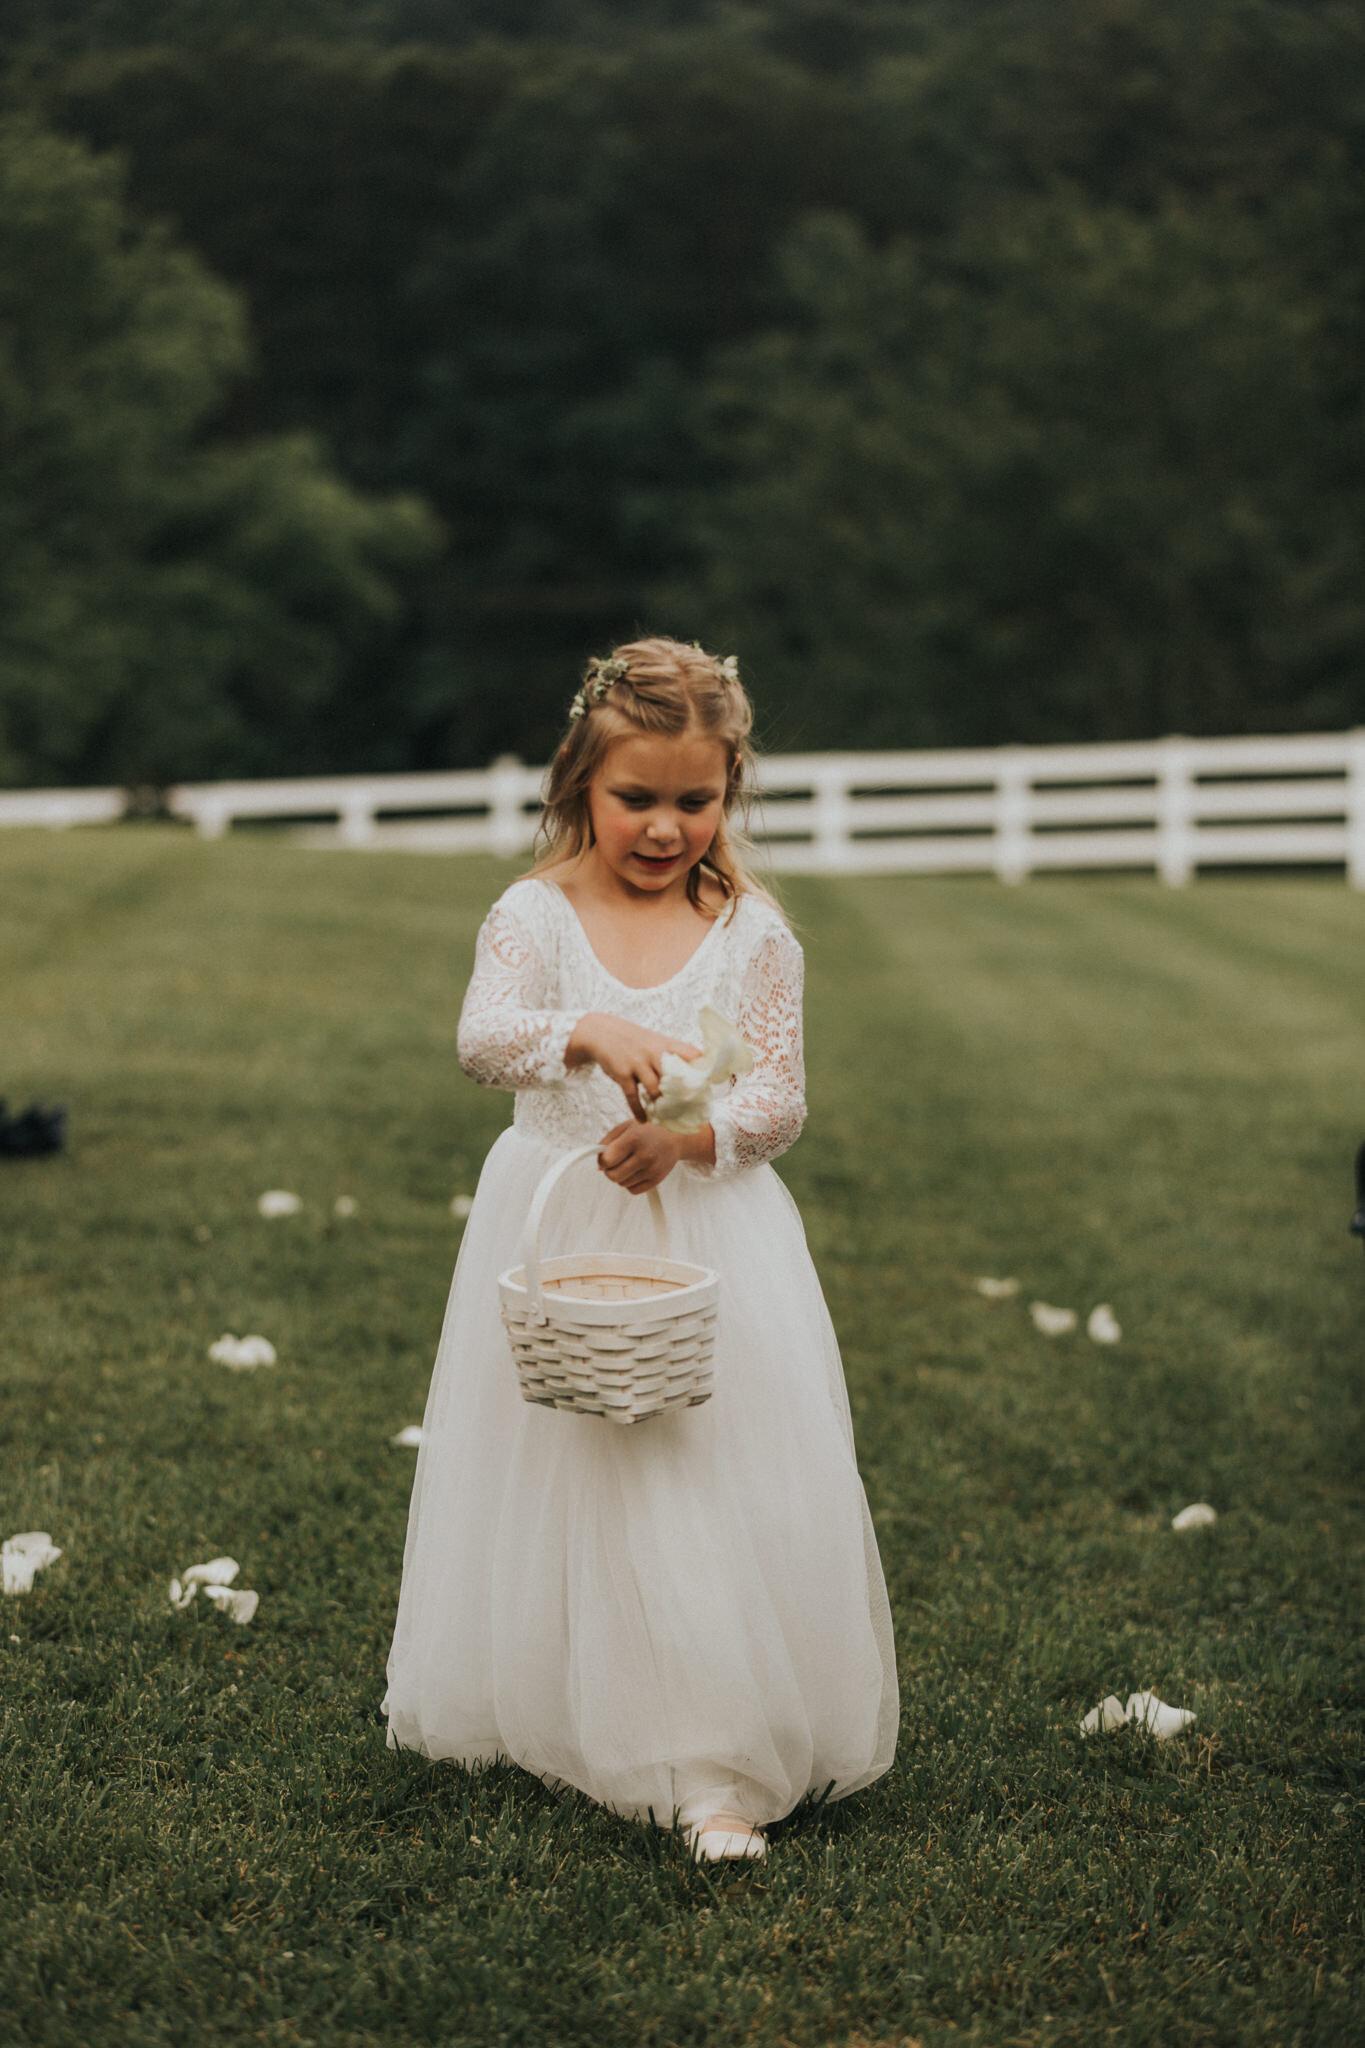 KateMatt-North-Georgia-Wedding-Photographer-Mountain-Laurel-Farm-95.jpg